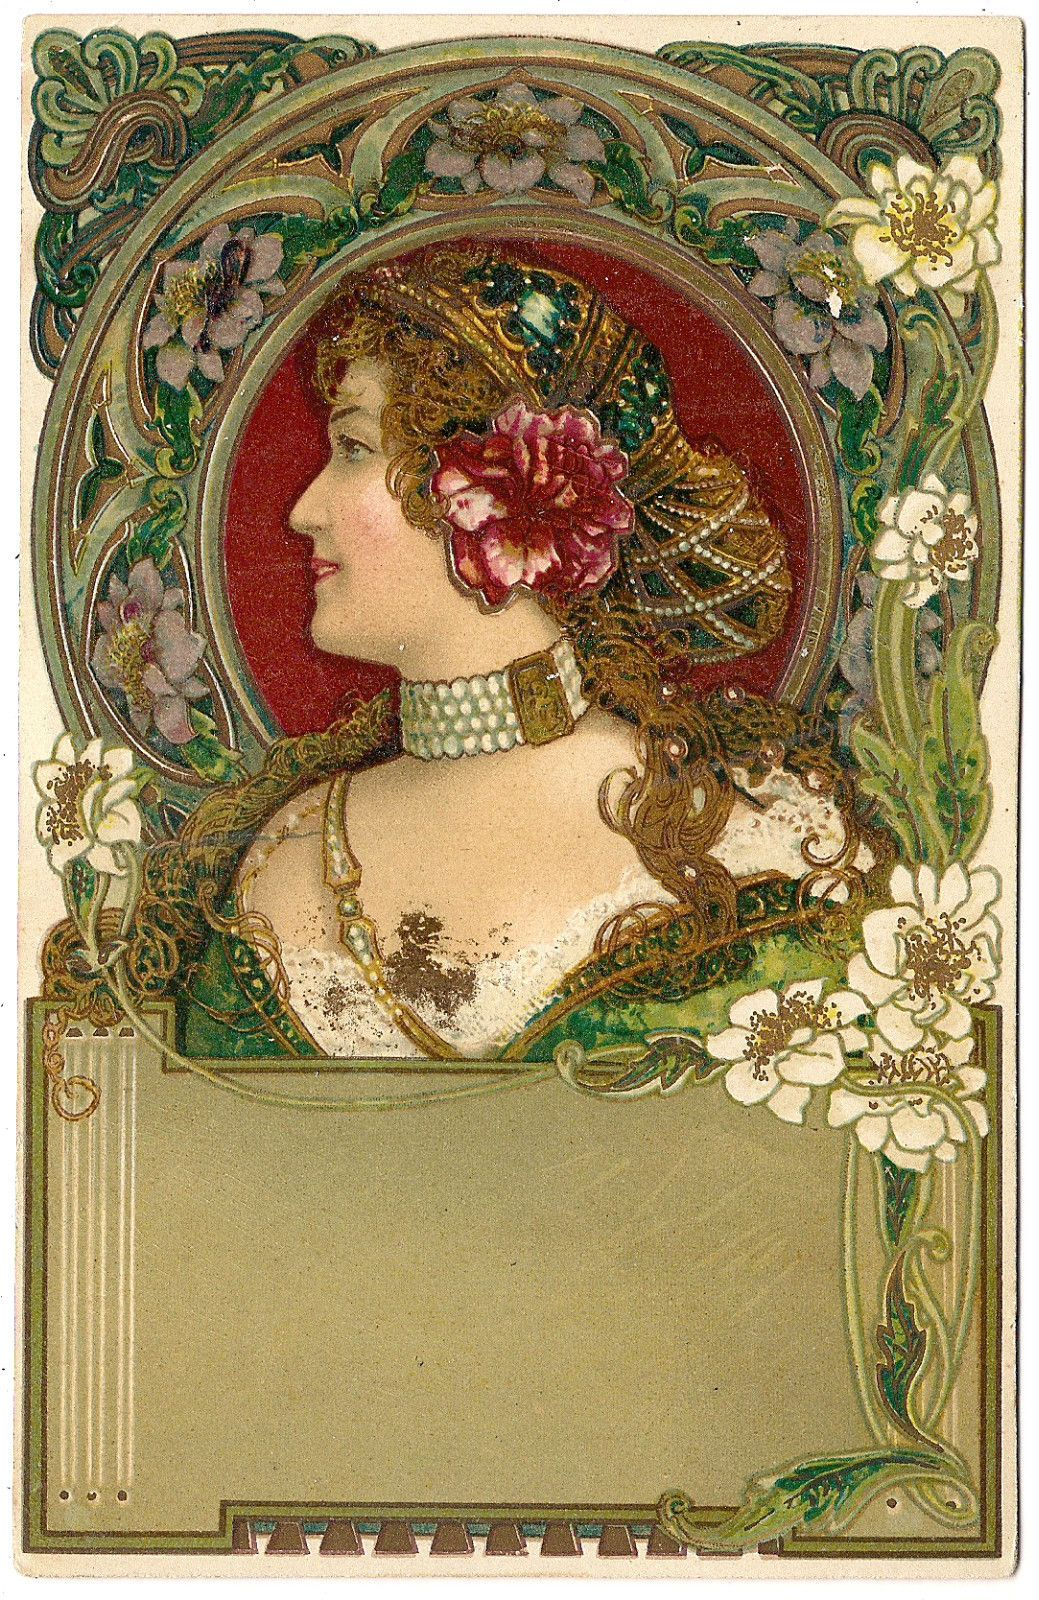 Wonderful Art Nouveau Postcard Of A Woman 1903 Ebay Art Nouveau Illustration Art Nouveau Poster Art